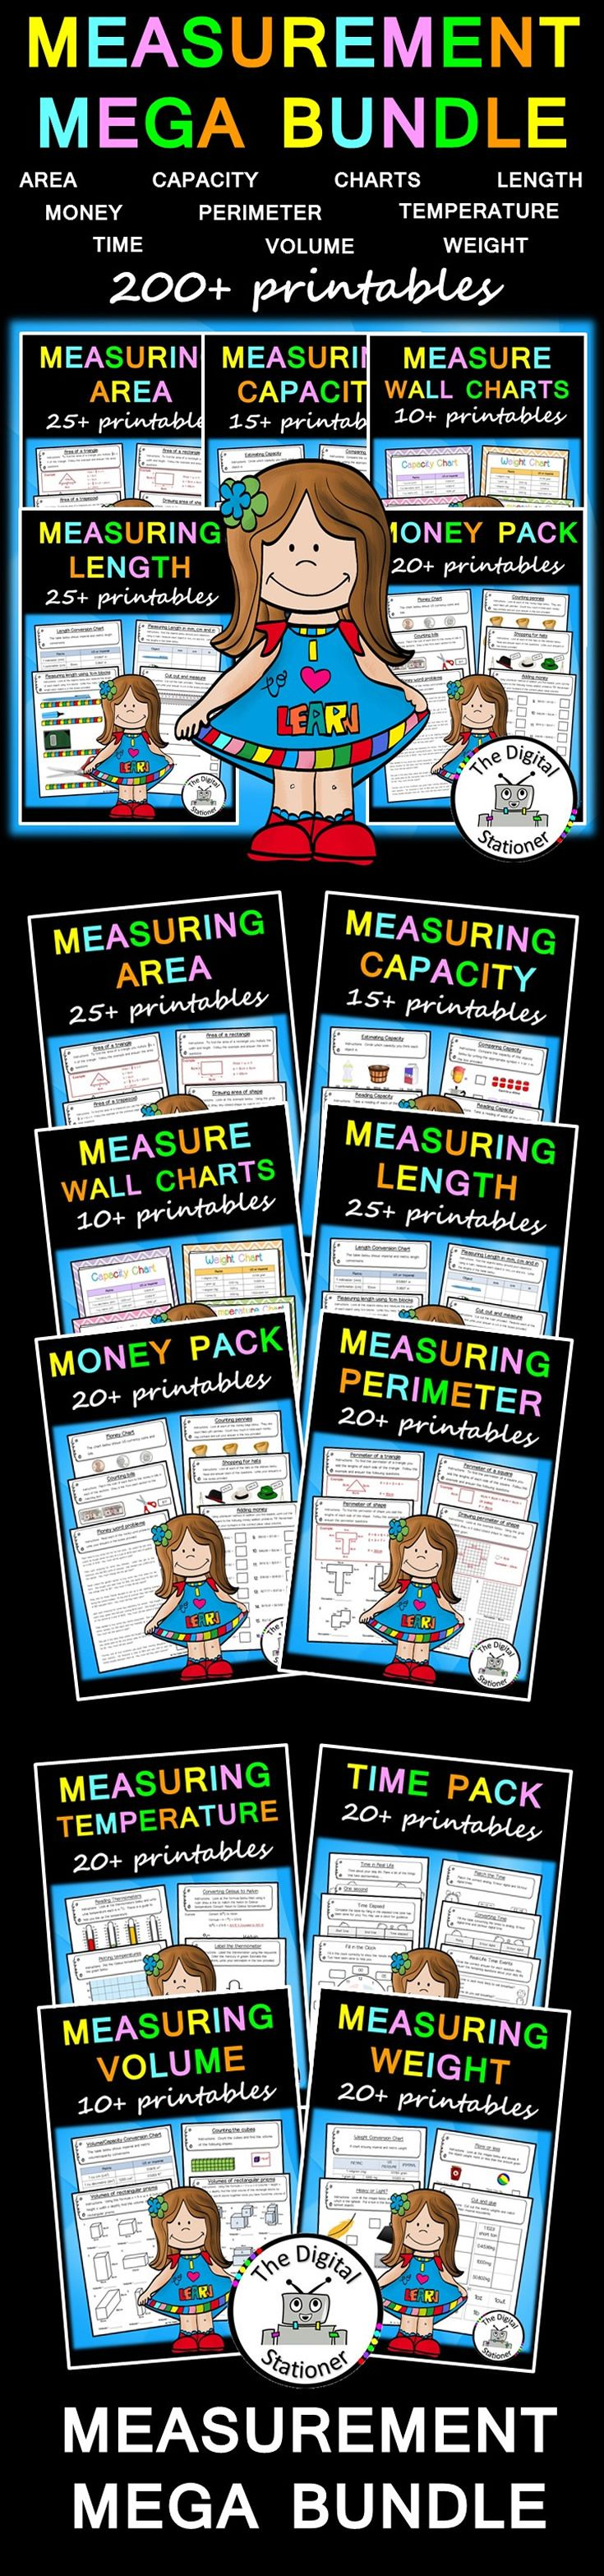 worksheet Temperature And Its Measurement Worksheet – Heat and Its Measurement Worksheet Answers